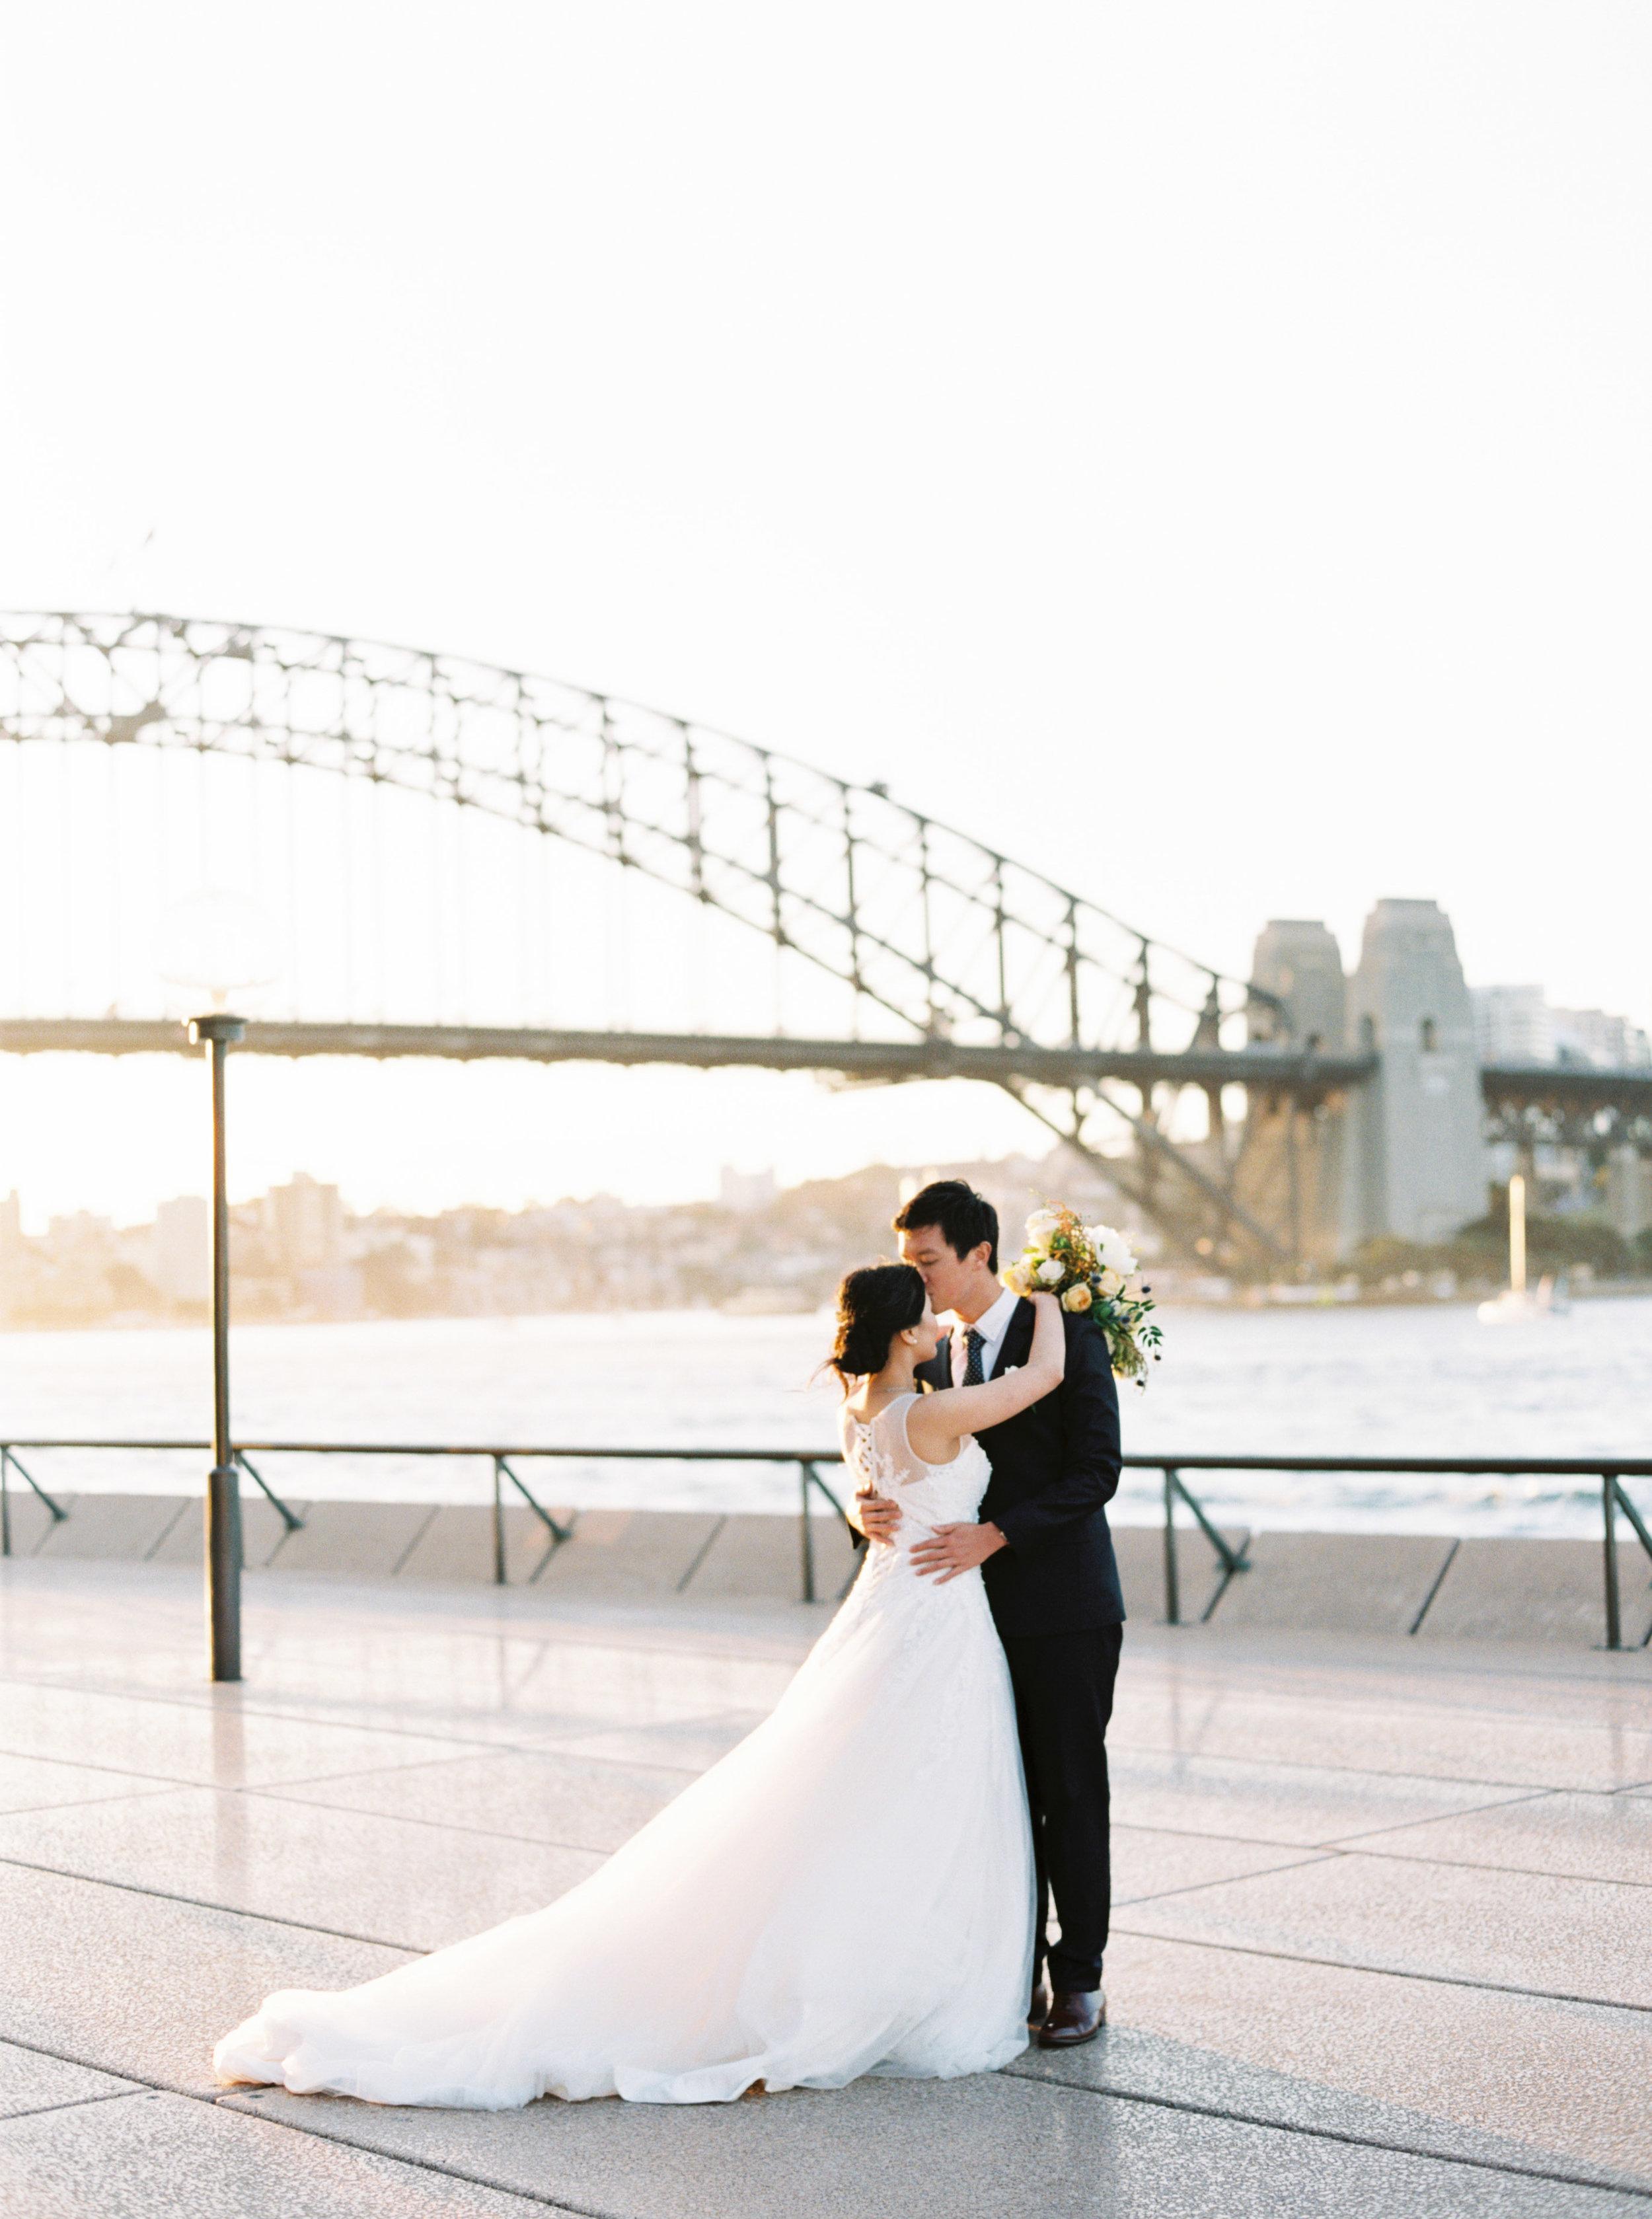 00044- Fine Art Film Australia Destination Sydney Wedding Photographer Sheri McMahon.jpg